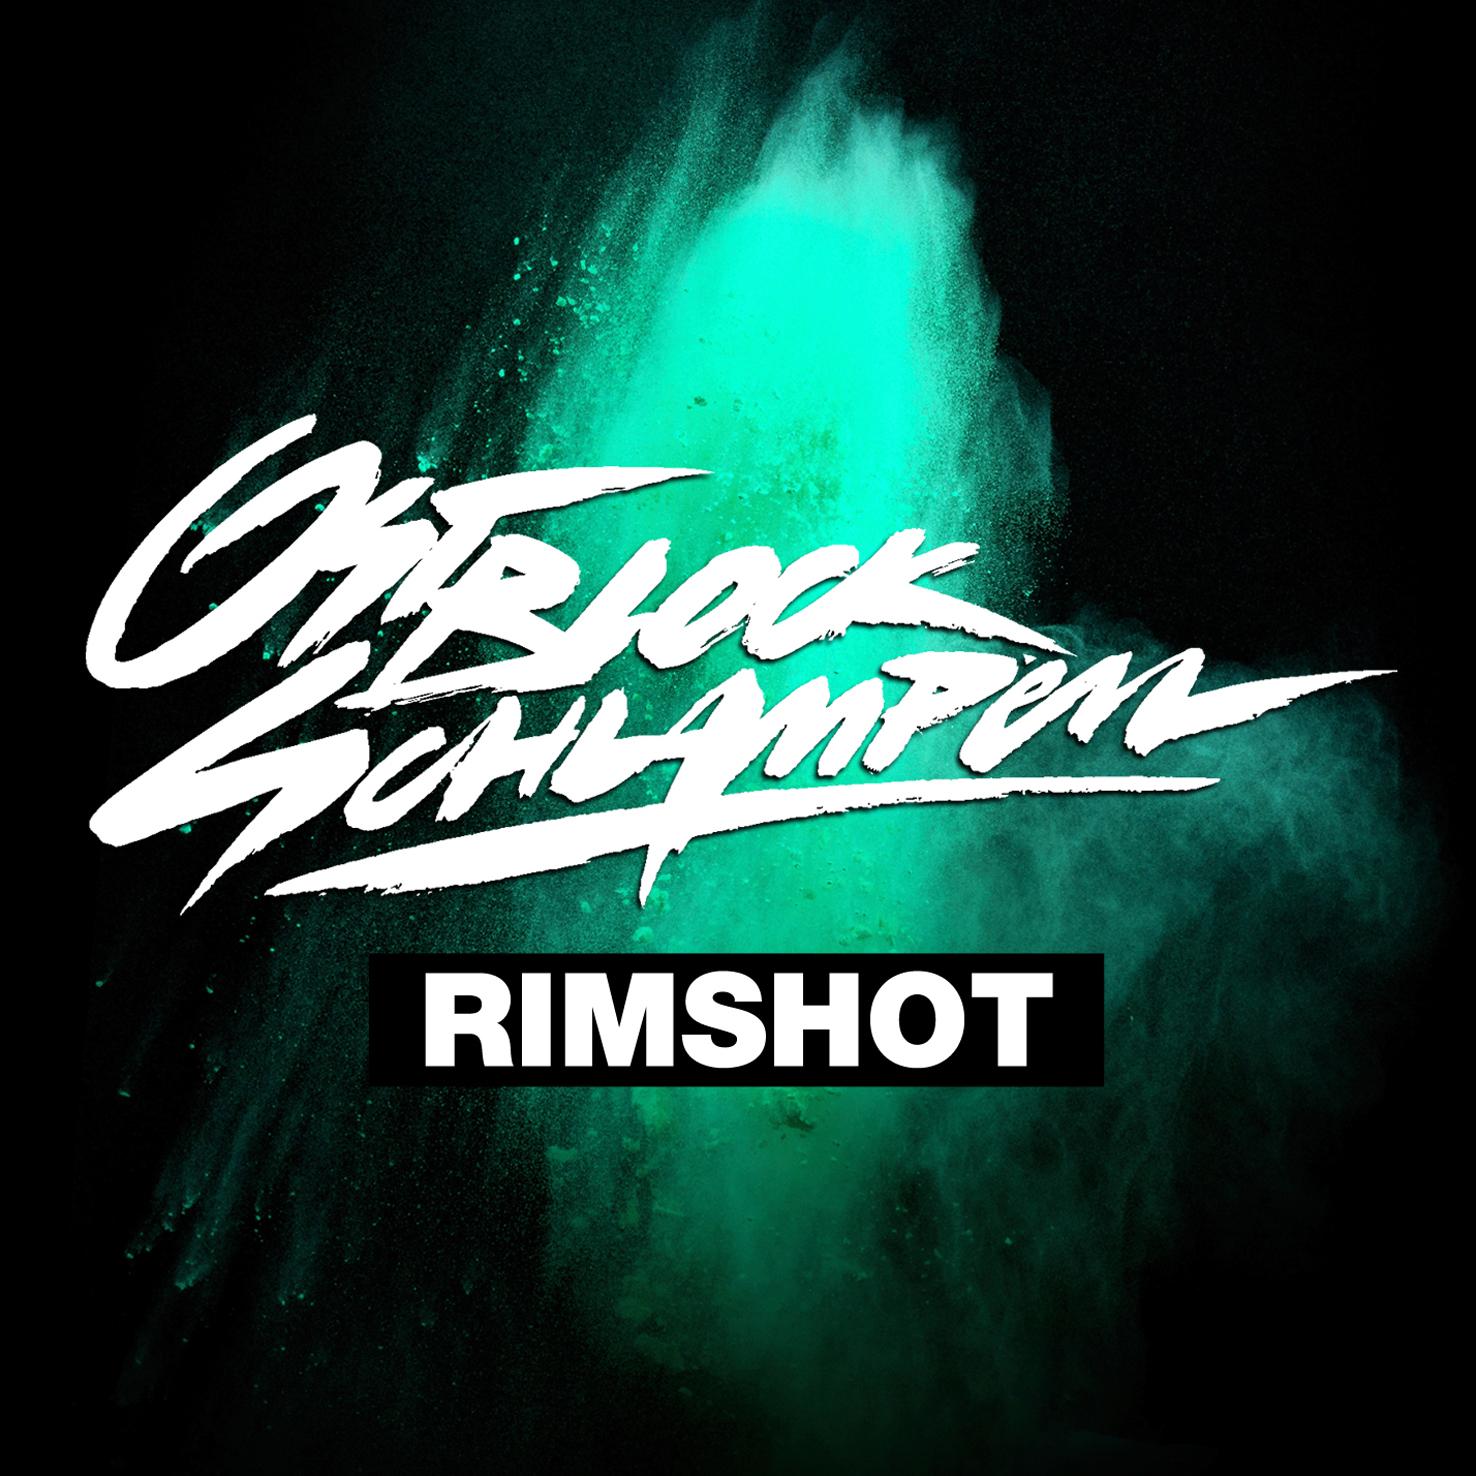 OBS_Rimshot_Online_RZ2